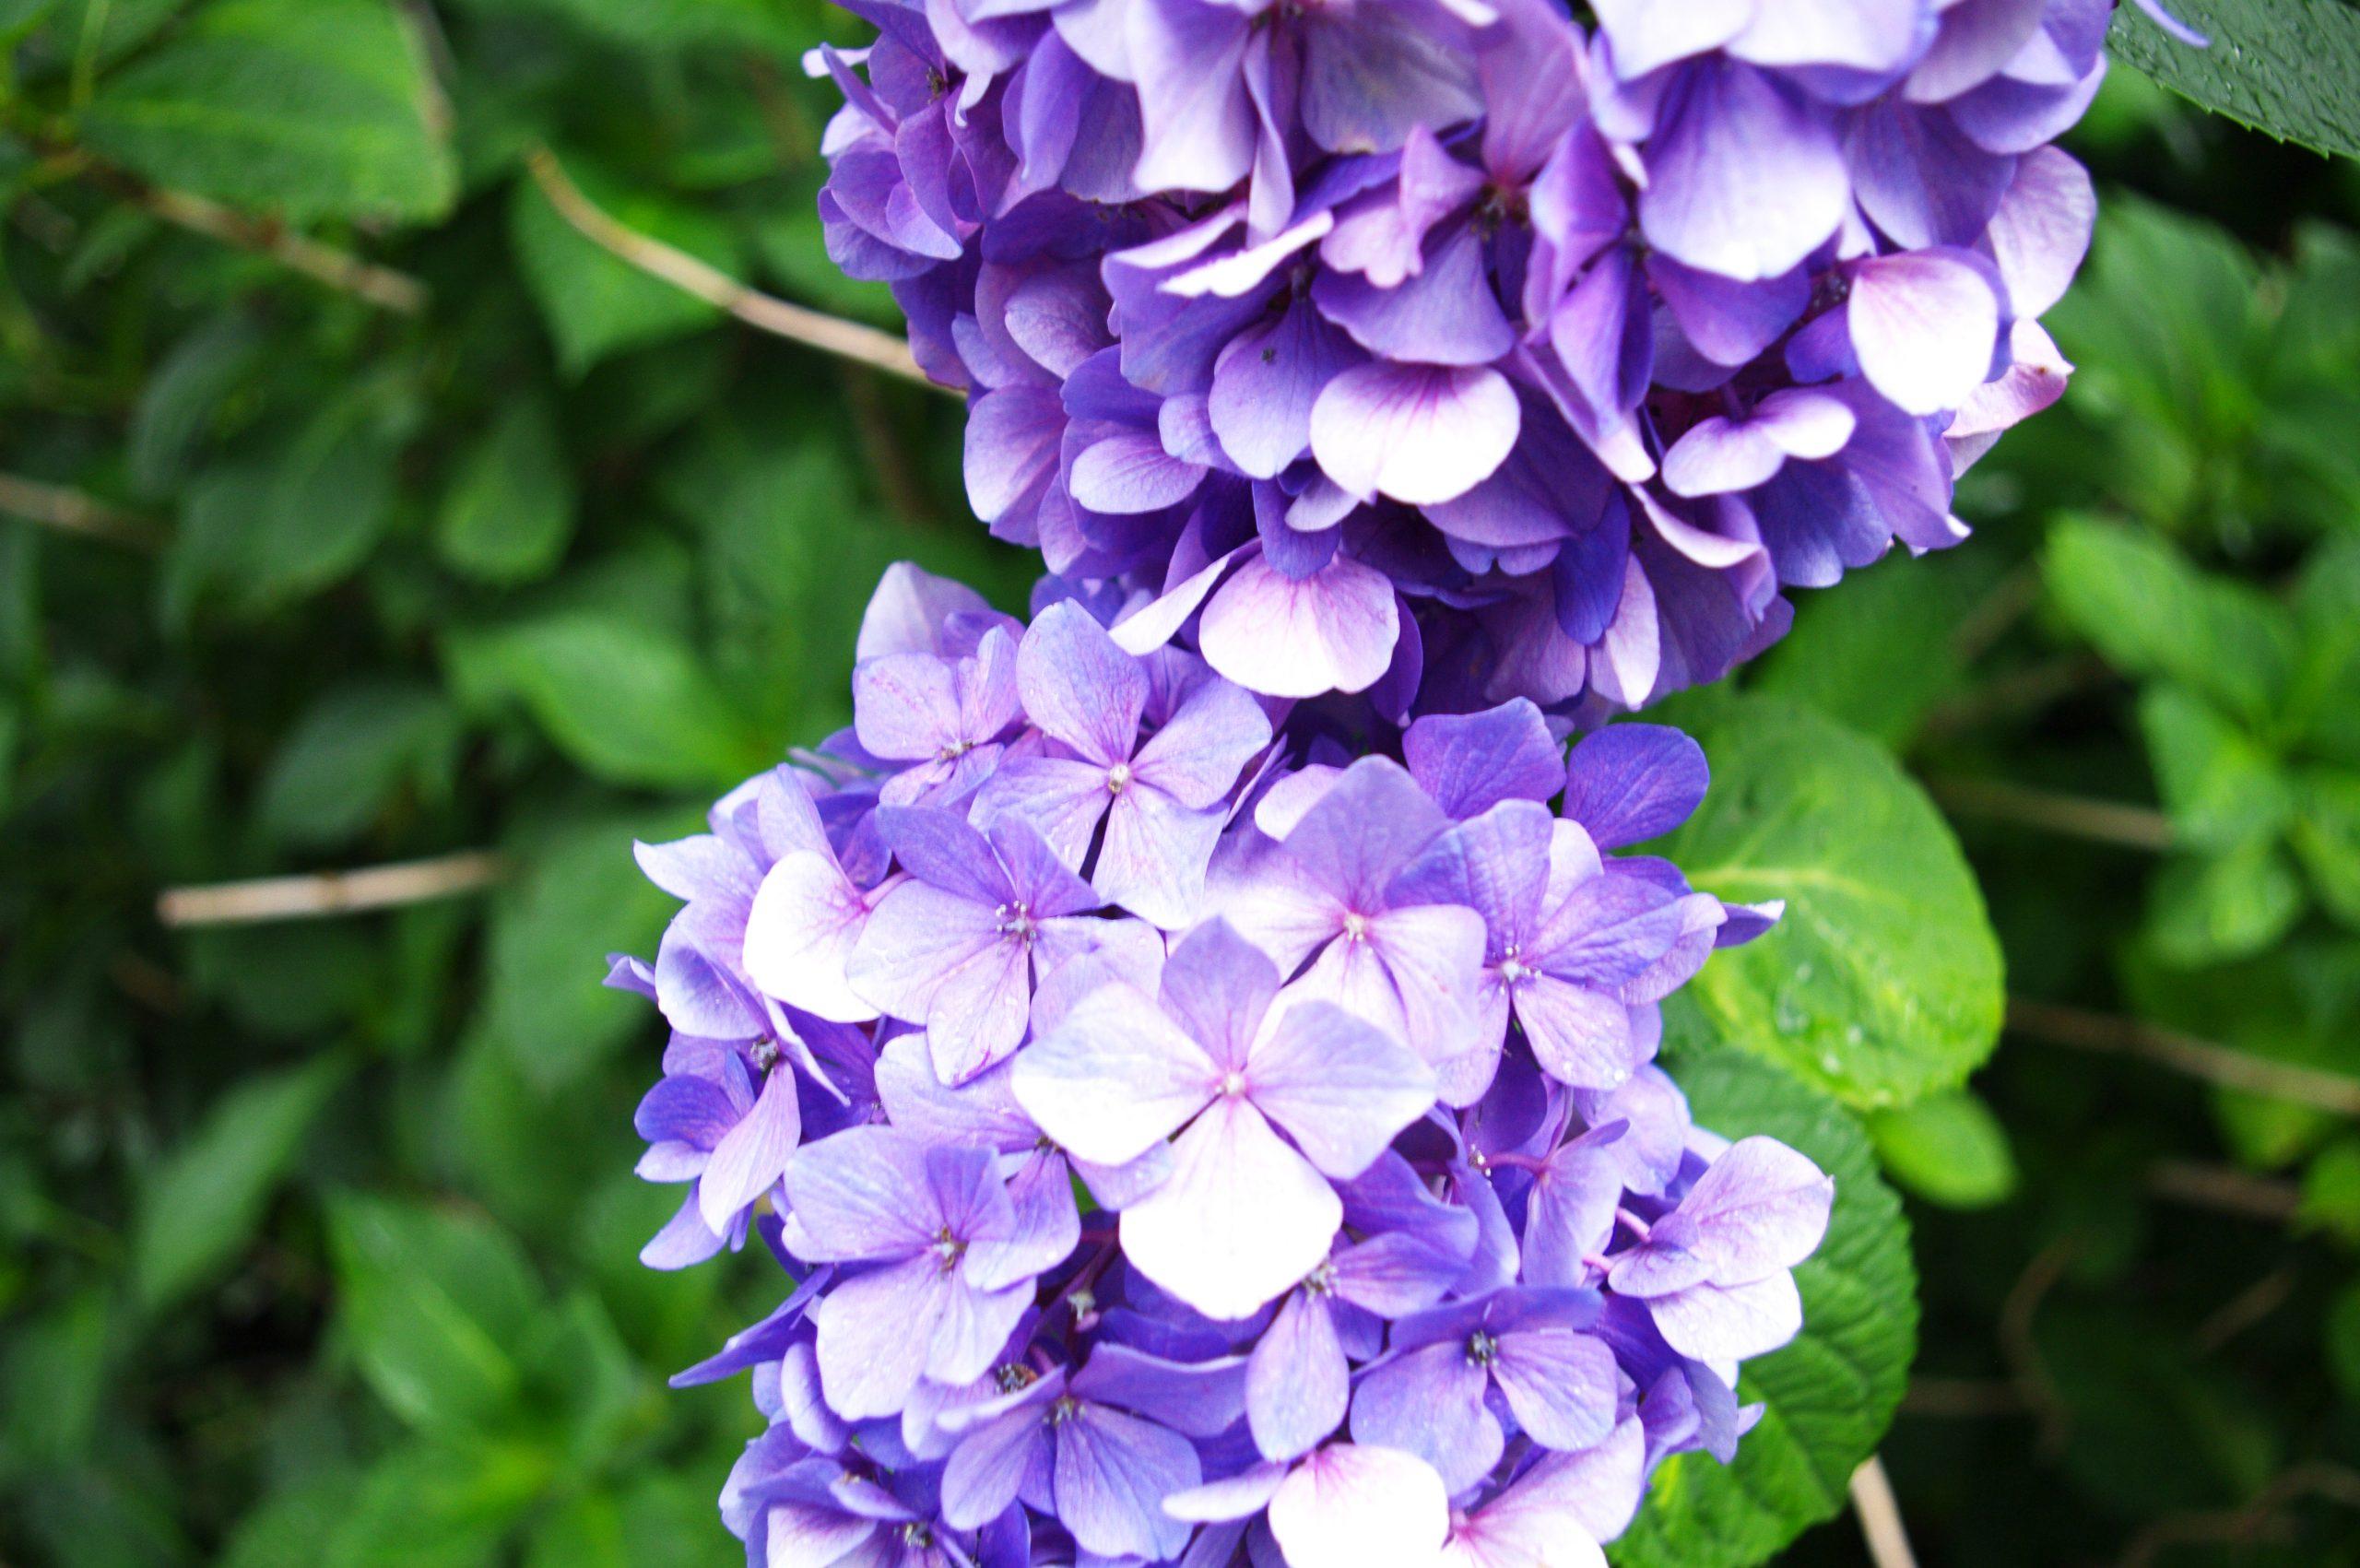 【PENTAX】紫陽花を撮る